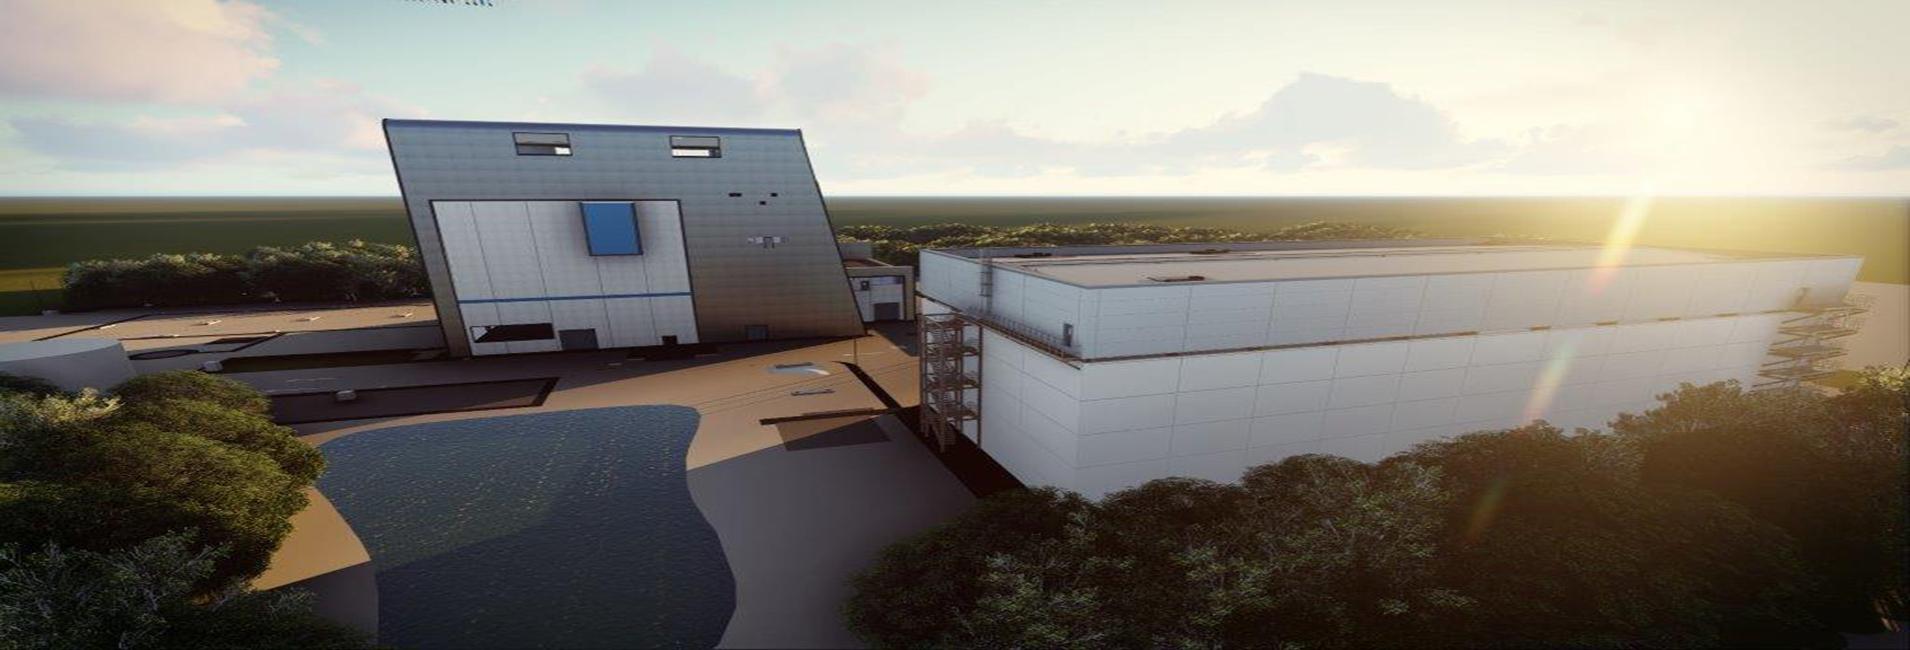 Teesside Energy Centre